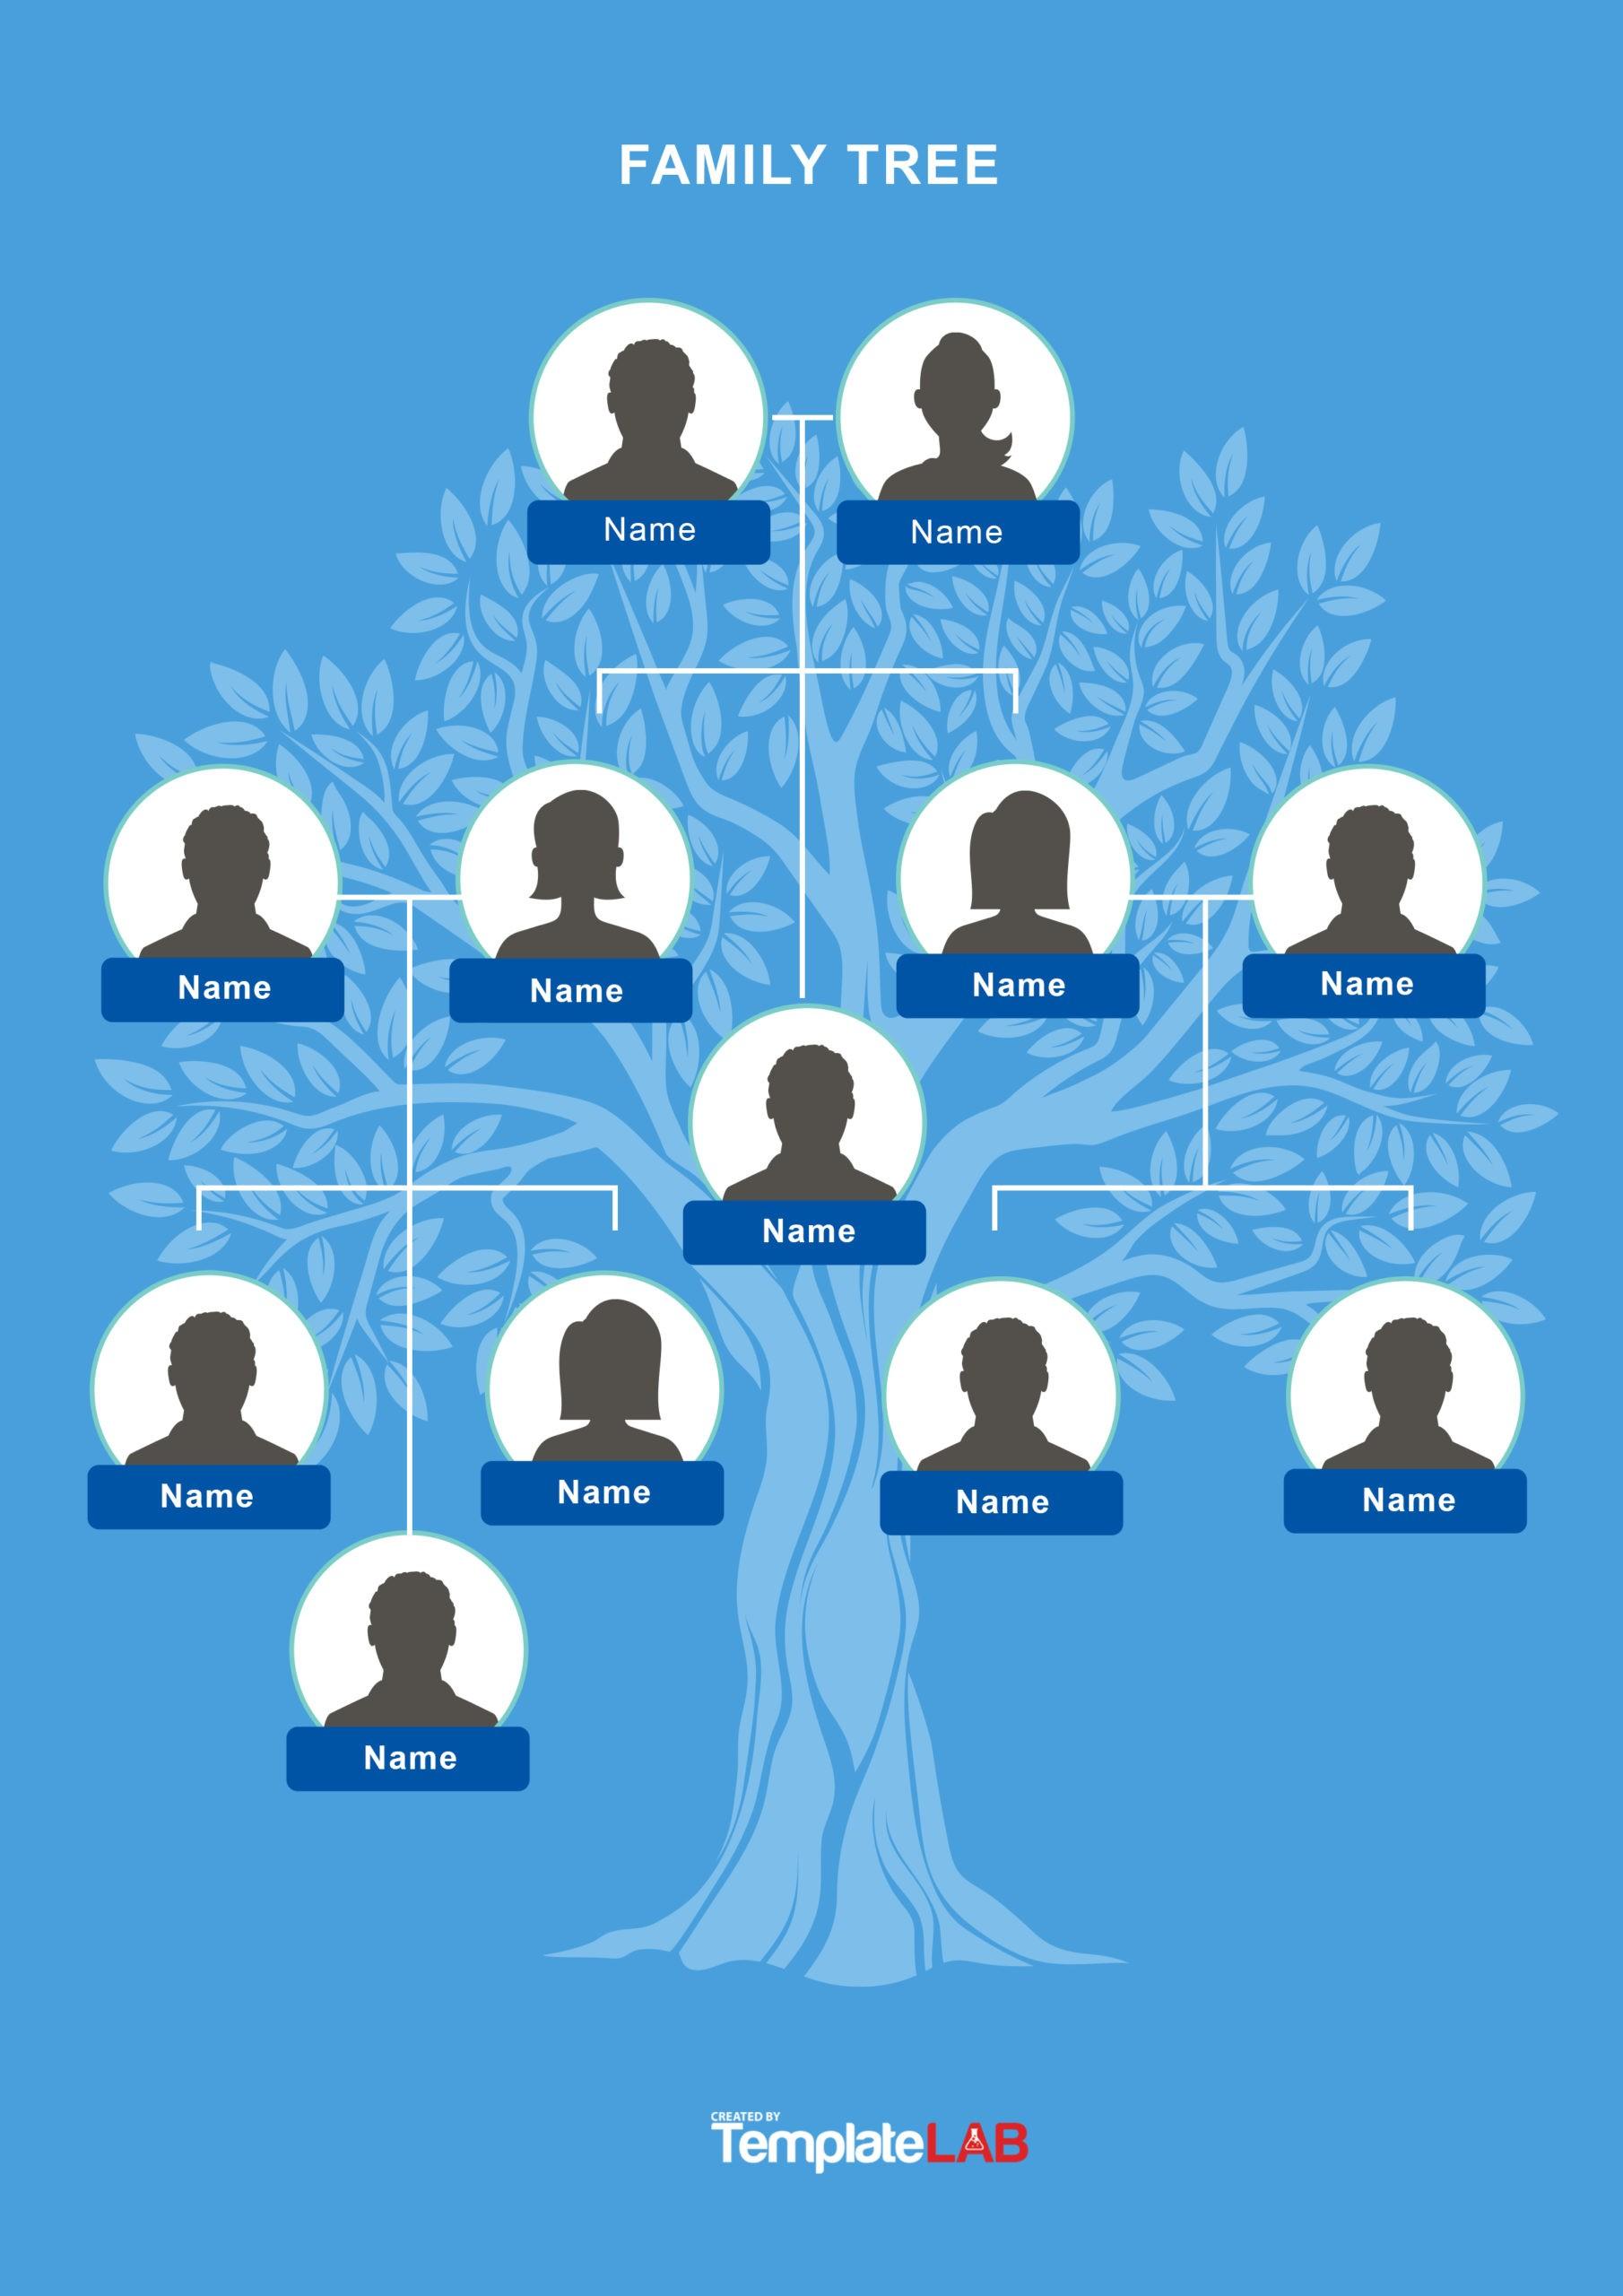 Free Family Tree Template 20 - TemplateLab.com